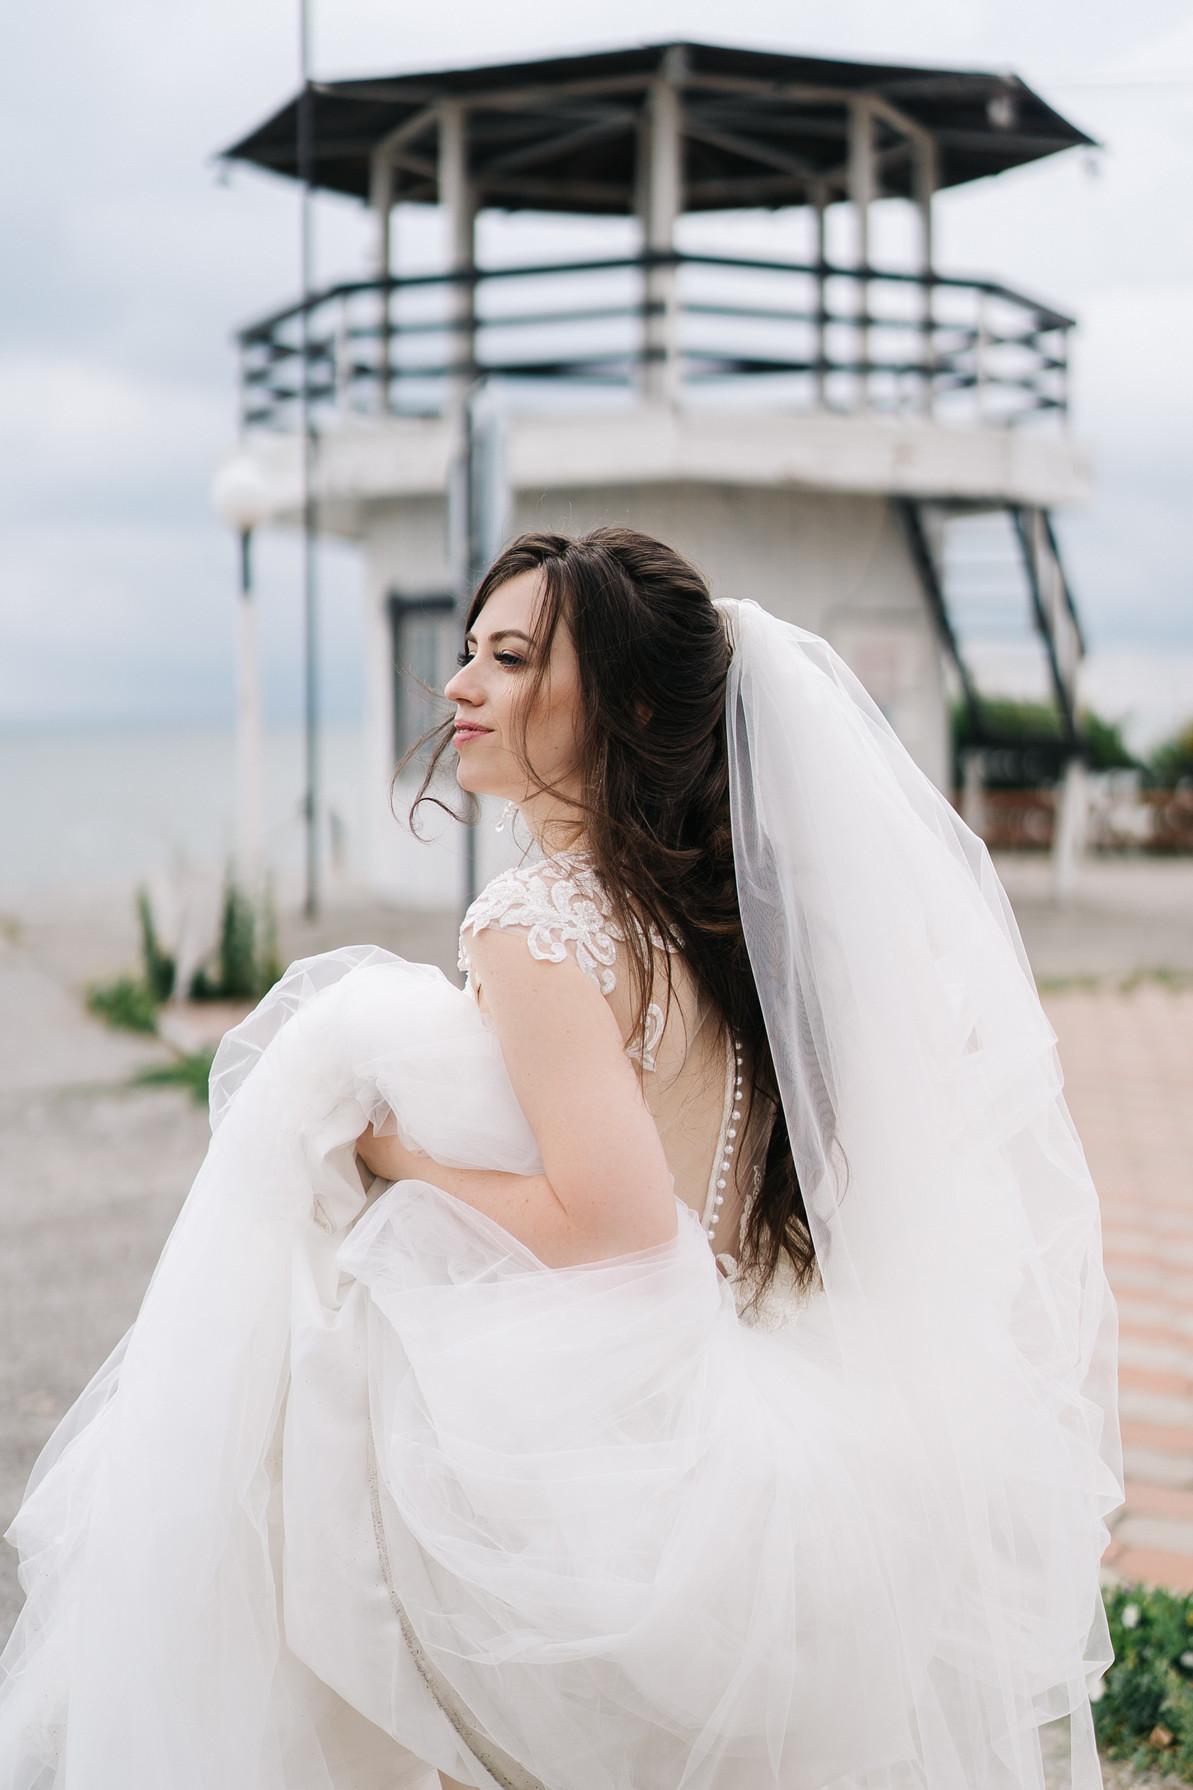 ArtSoul_Wedding_anons-44.jpg